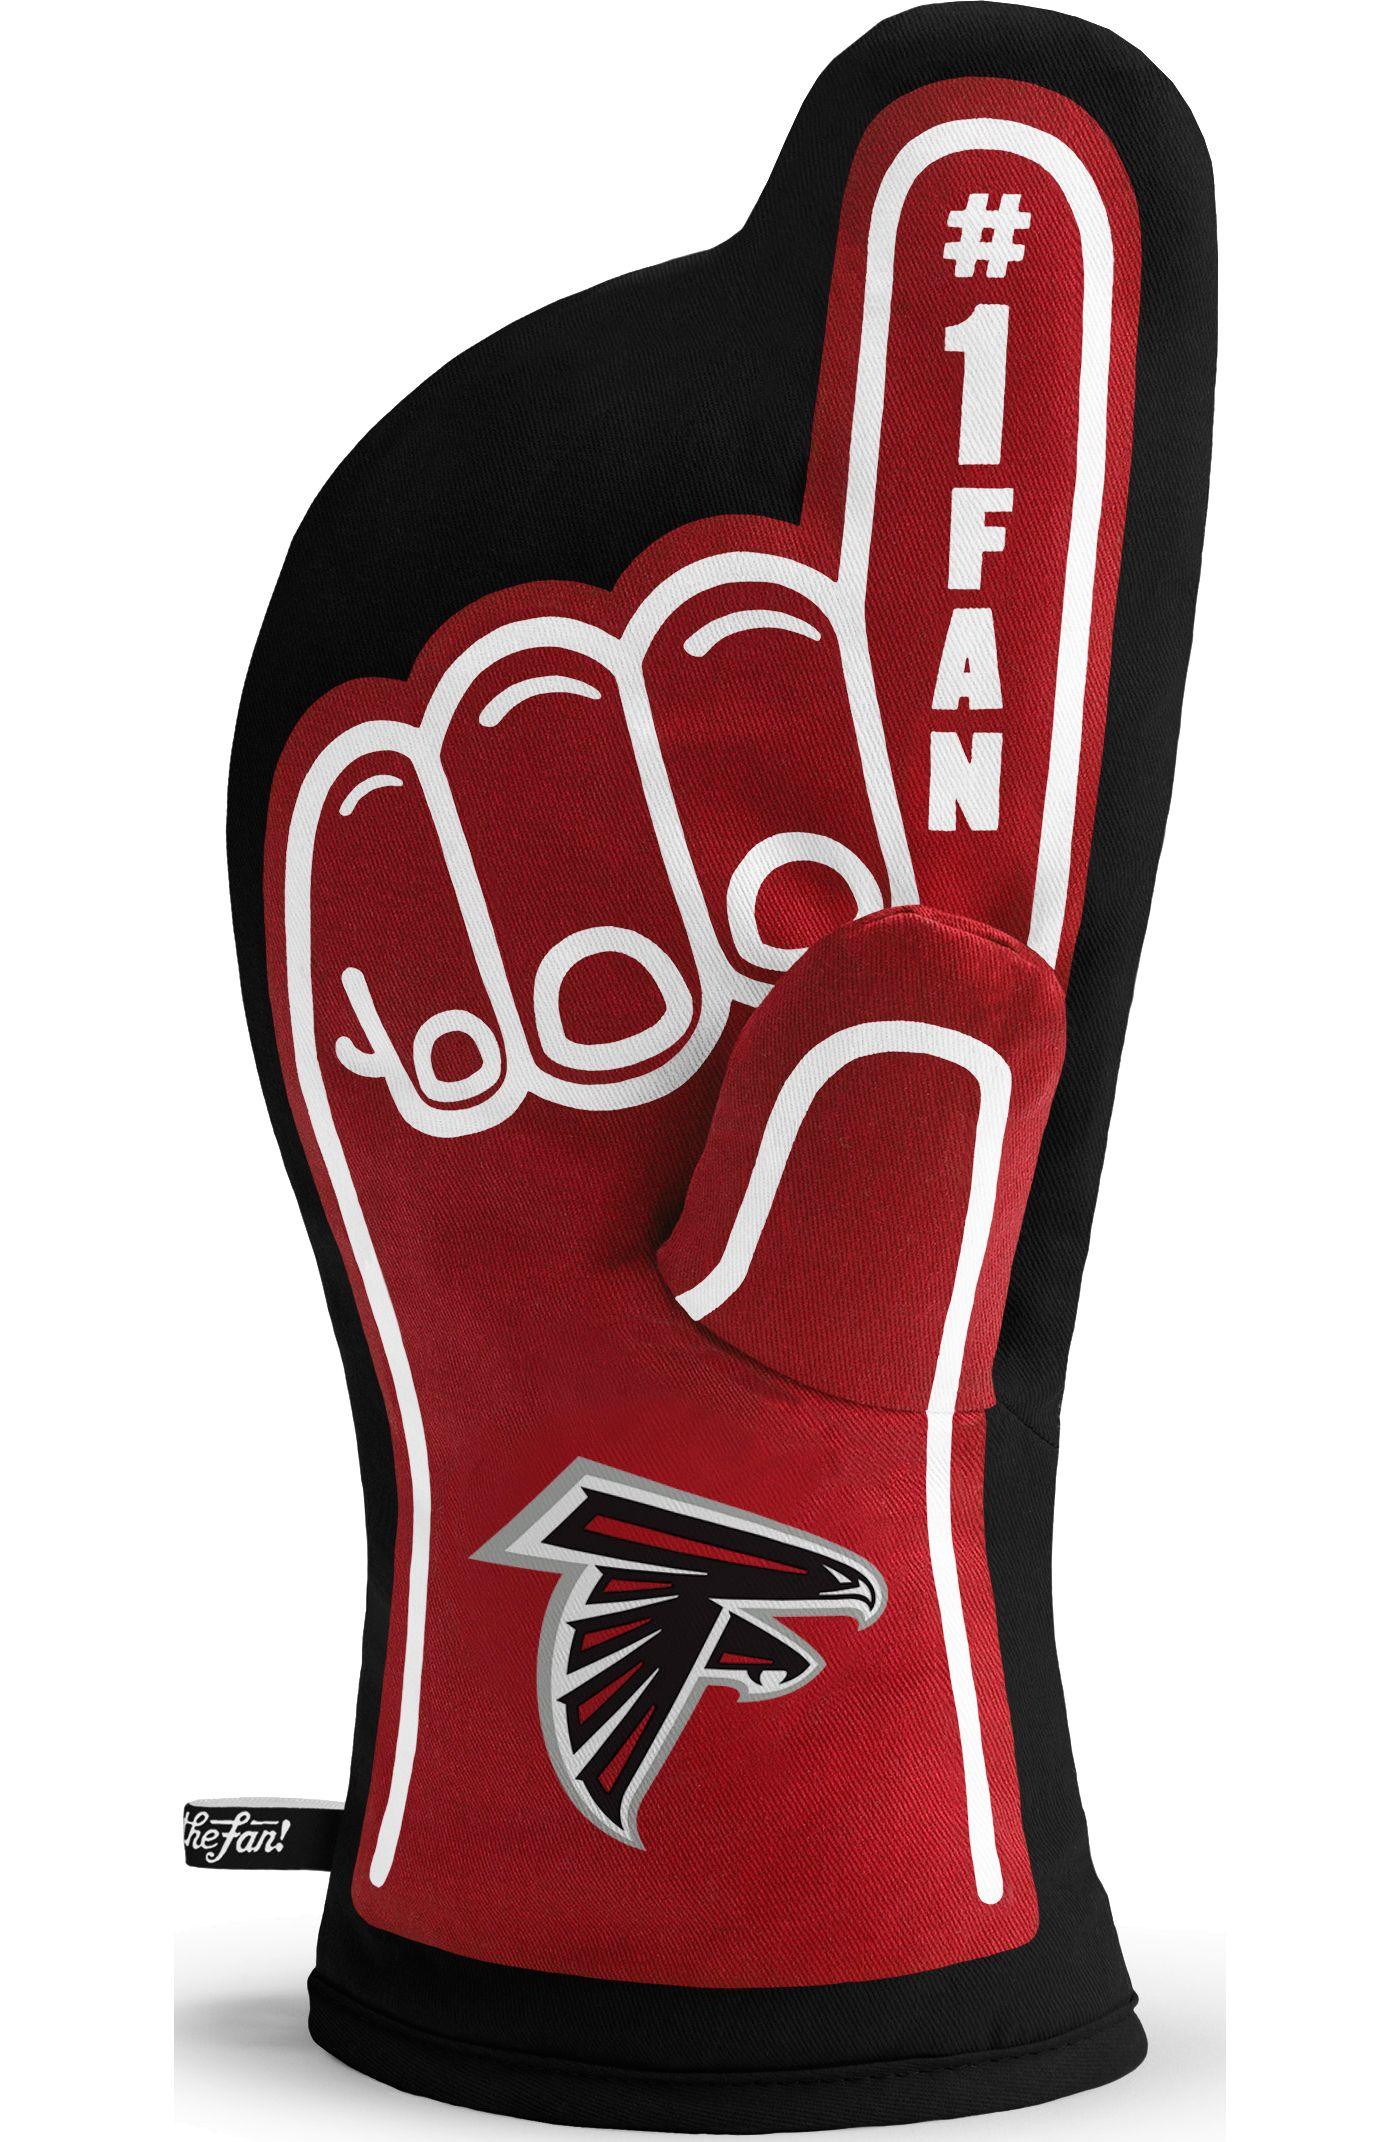 You The Fan Atlanta Falcons #1 Oven Mitt